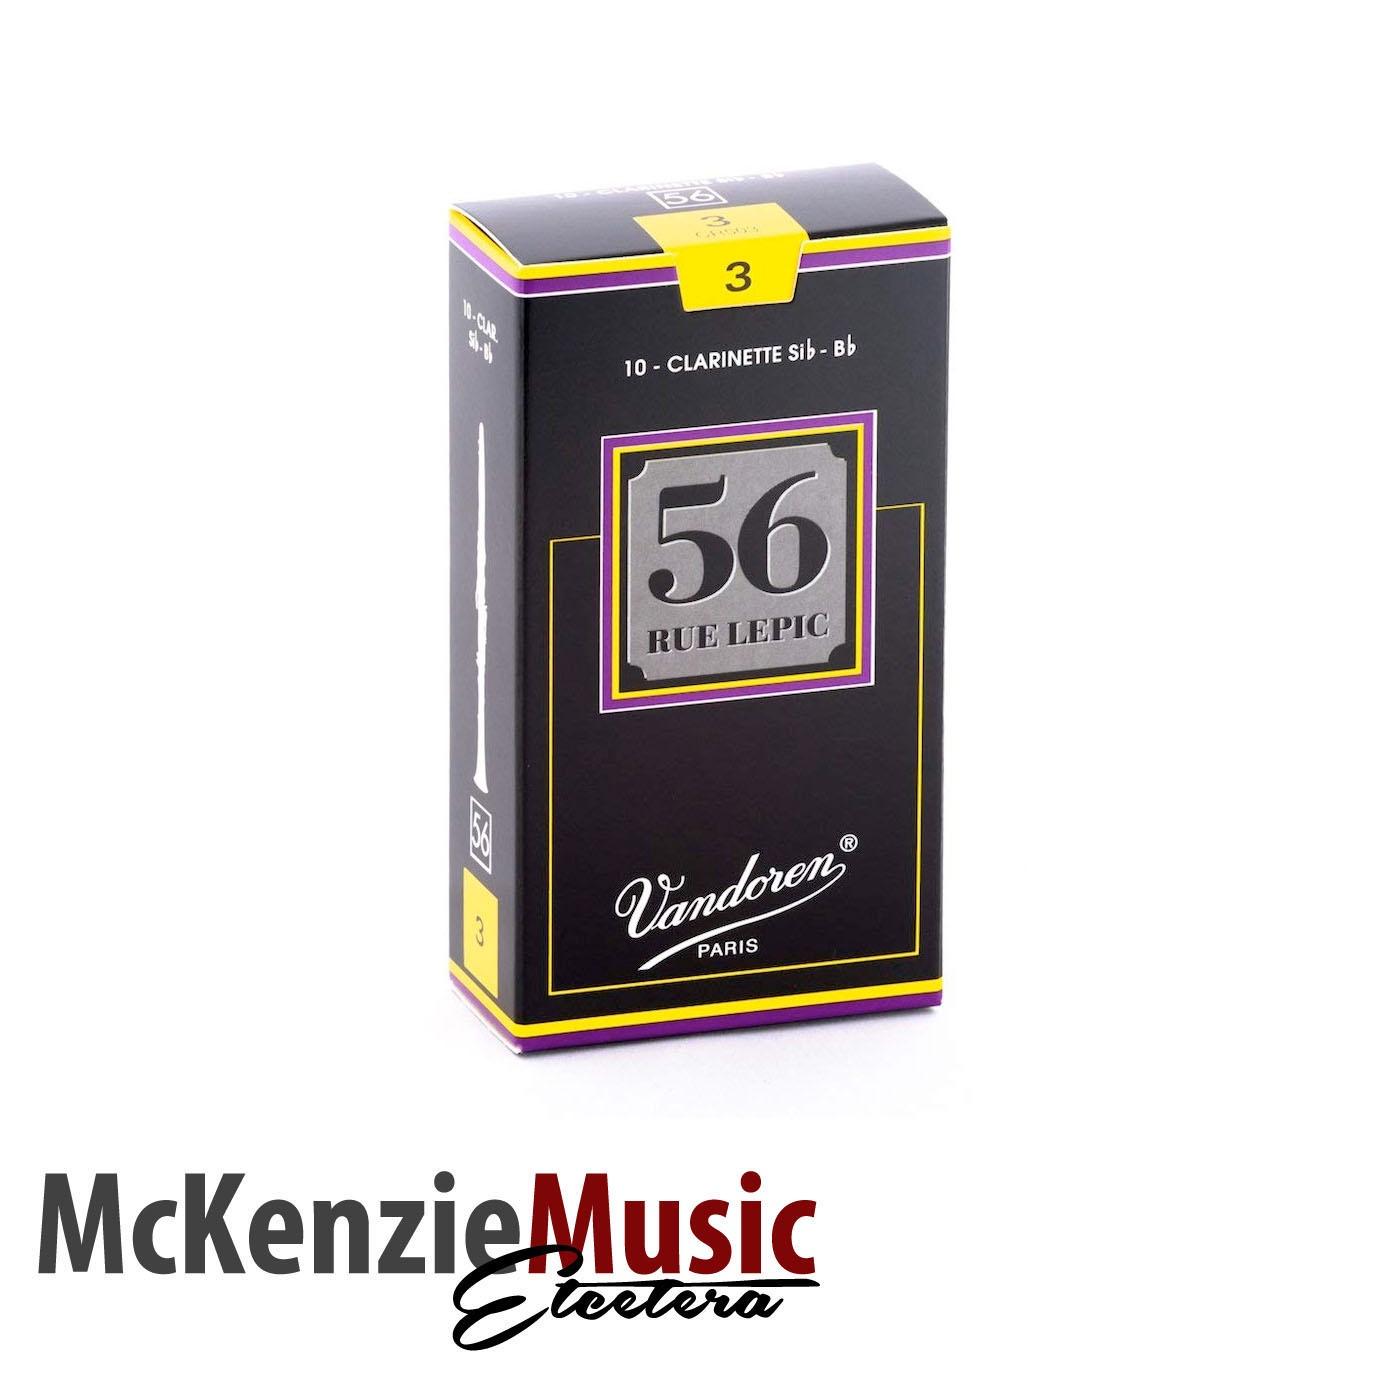 Vandoren 56 Rue Lepic Clarinet Reeds Box 10